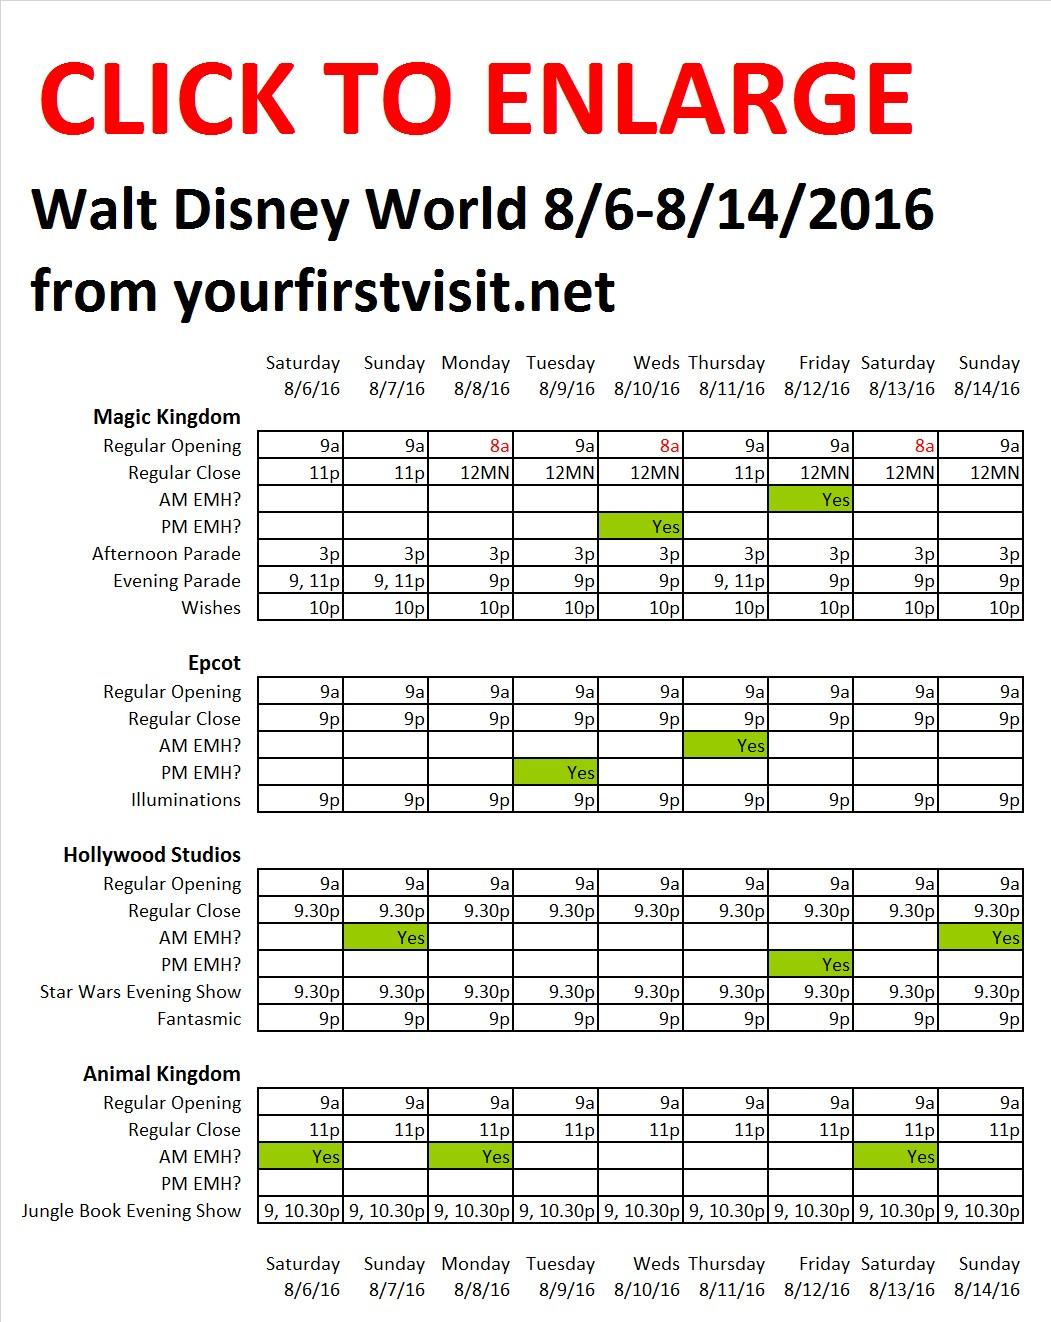 Disney World 8-6 to 8-14-2016 from yourfirstvisit.net